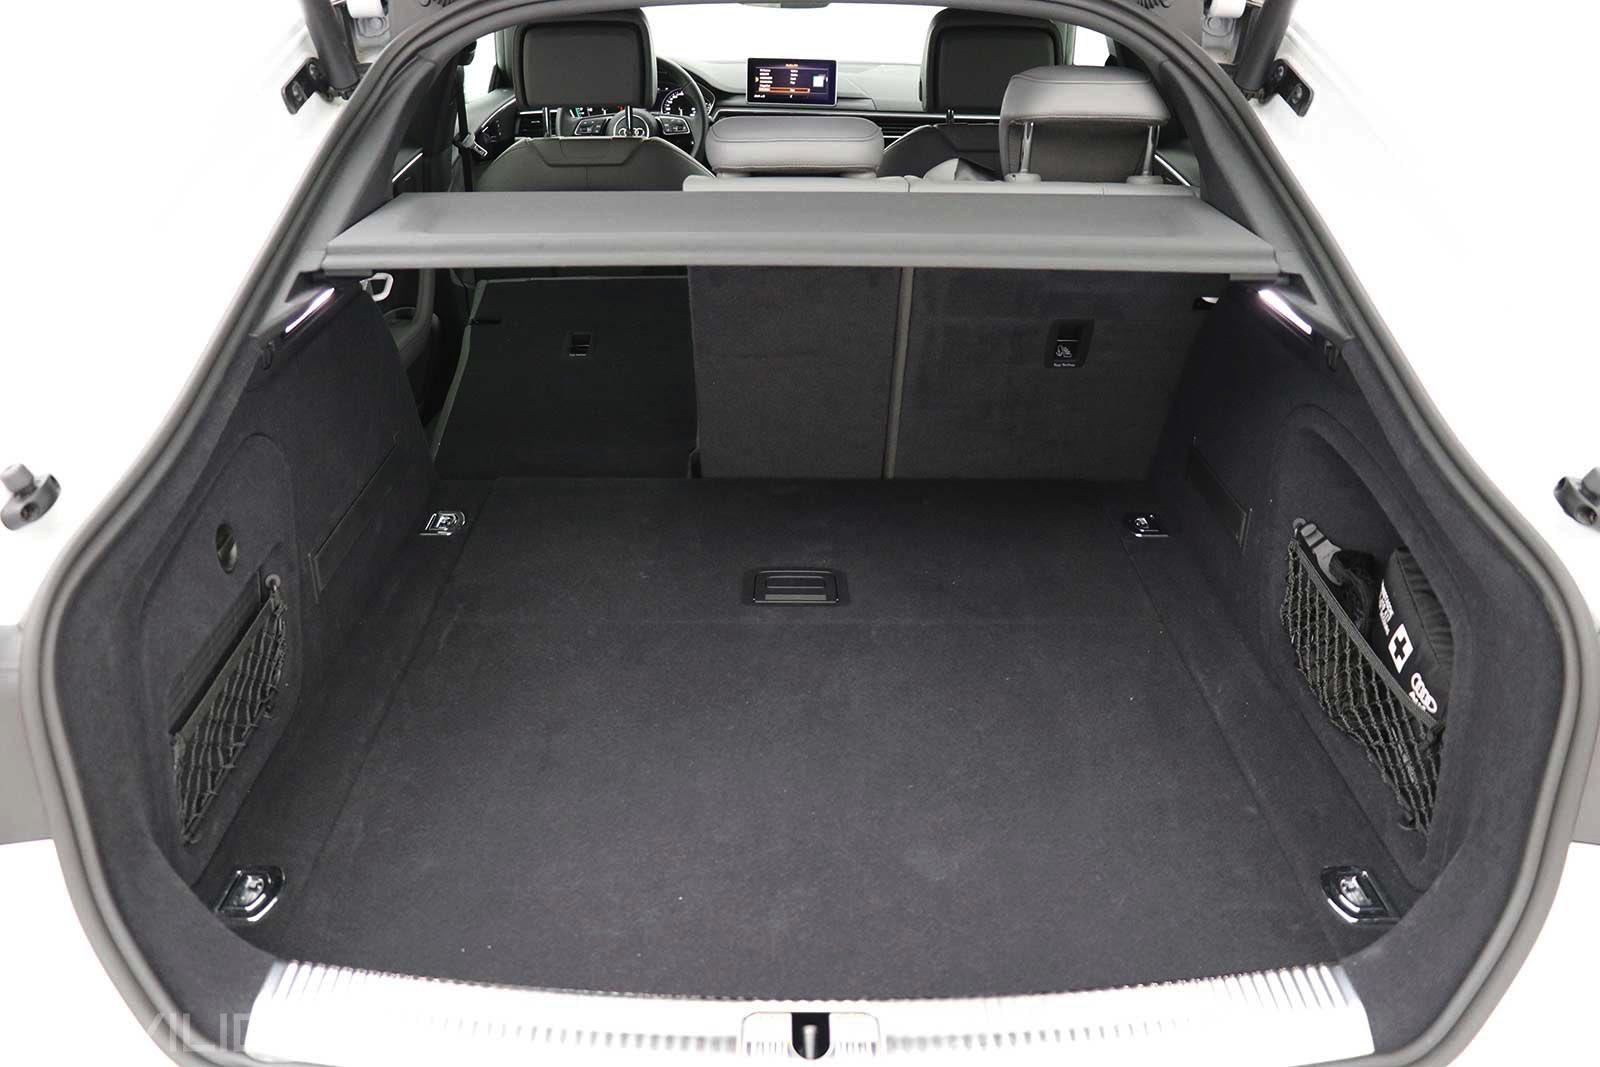 Maletero del Audi A5 g-tron Sportback